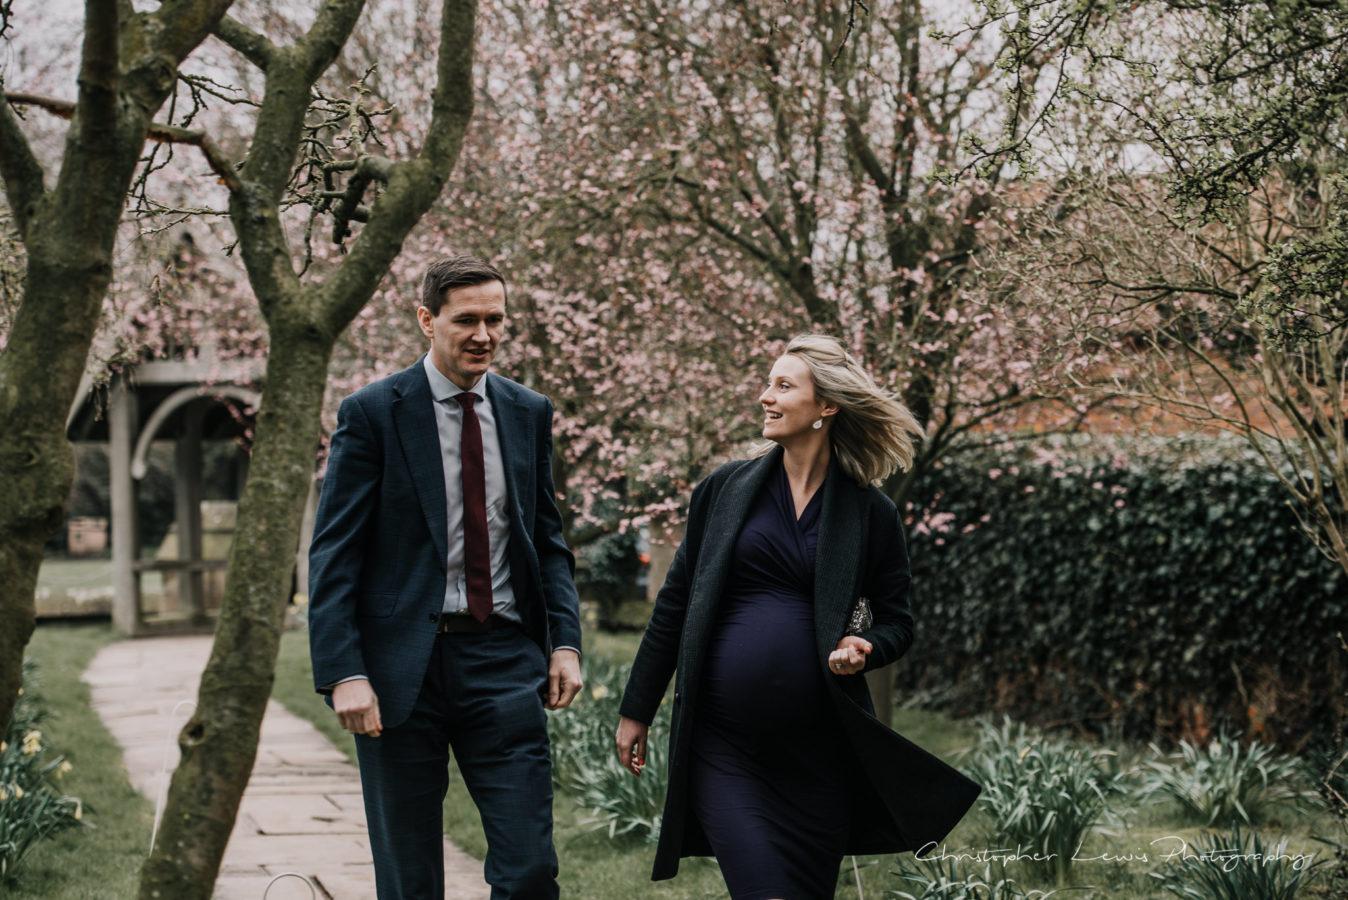 Thief-Hall-Wedding-Christopher-Lewis-Photography-16